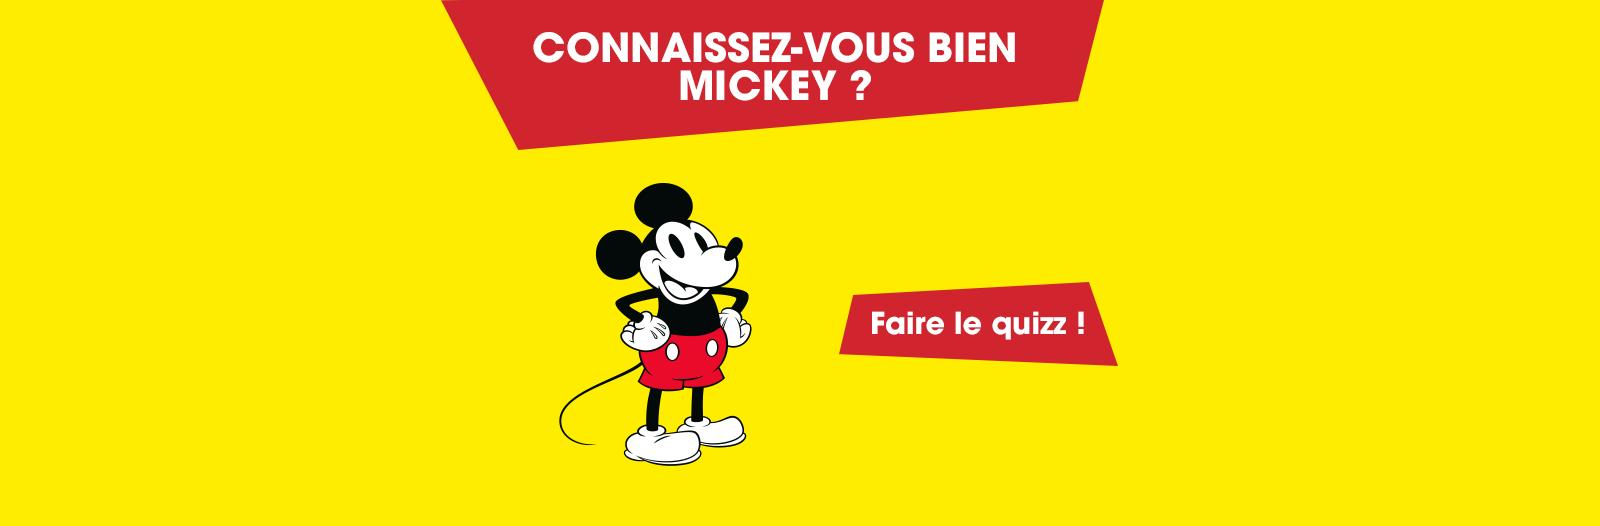 quizz 90 ans de Mickey